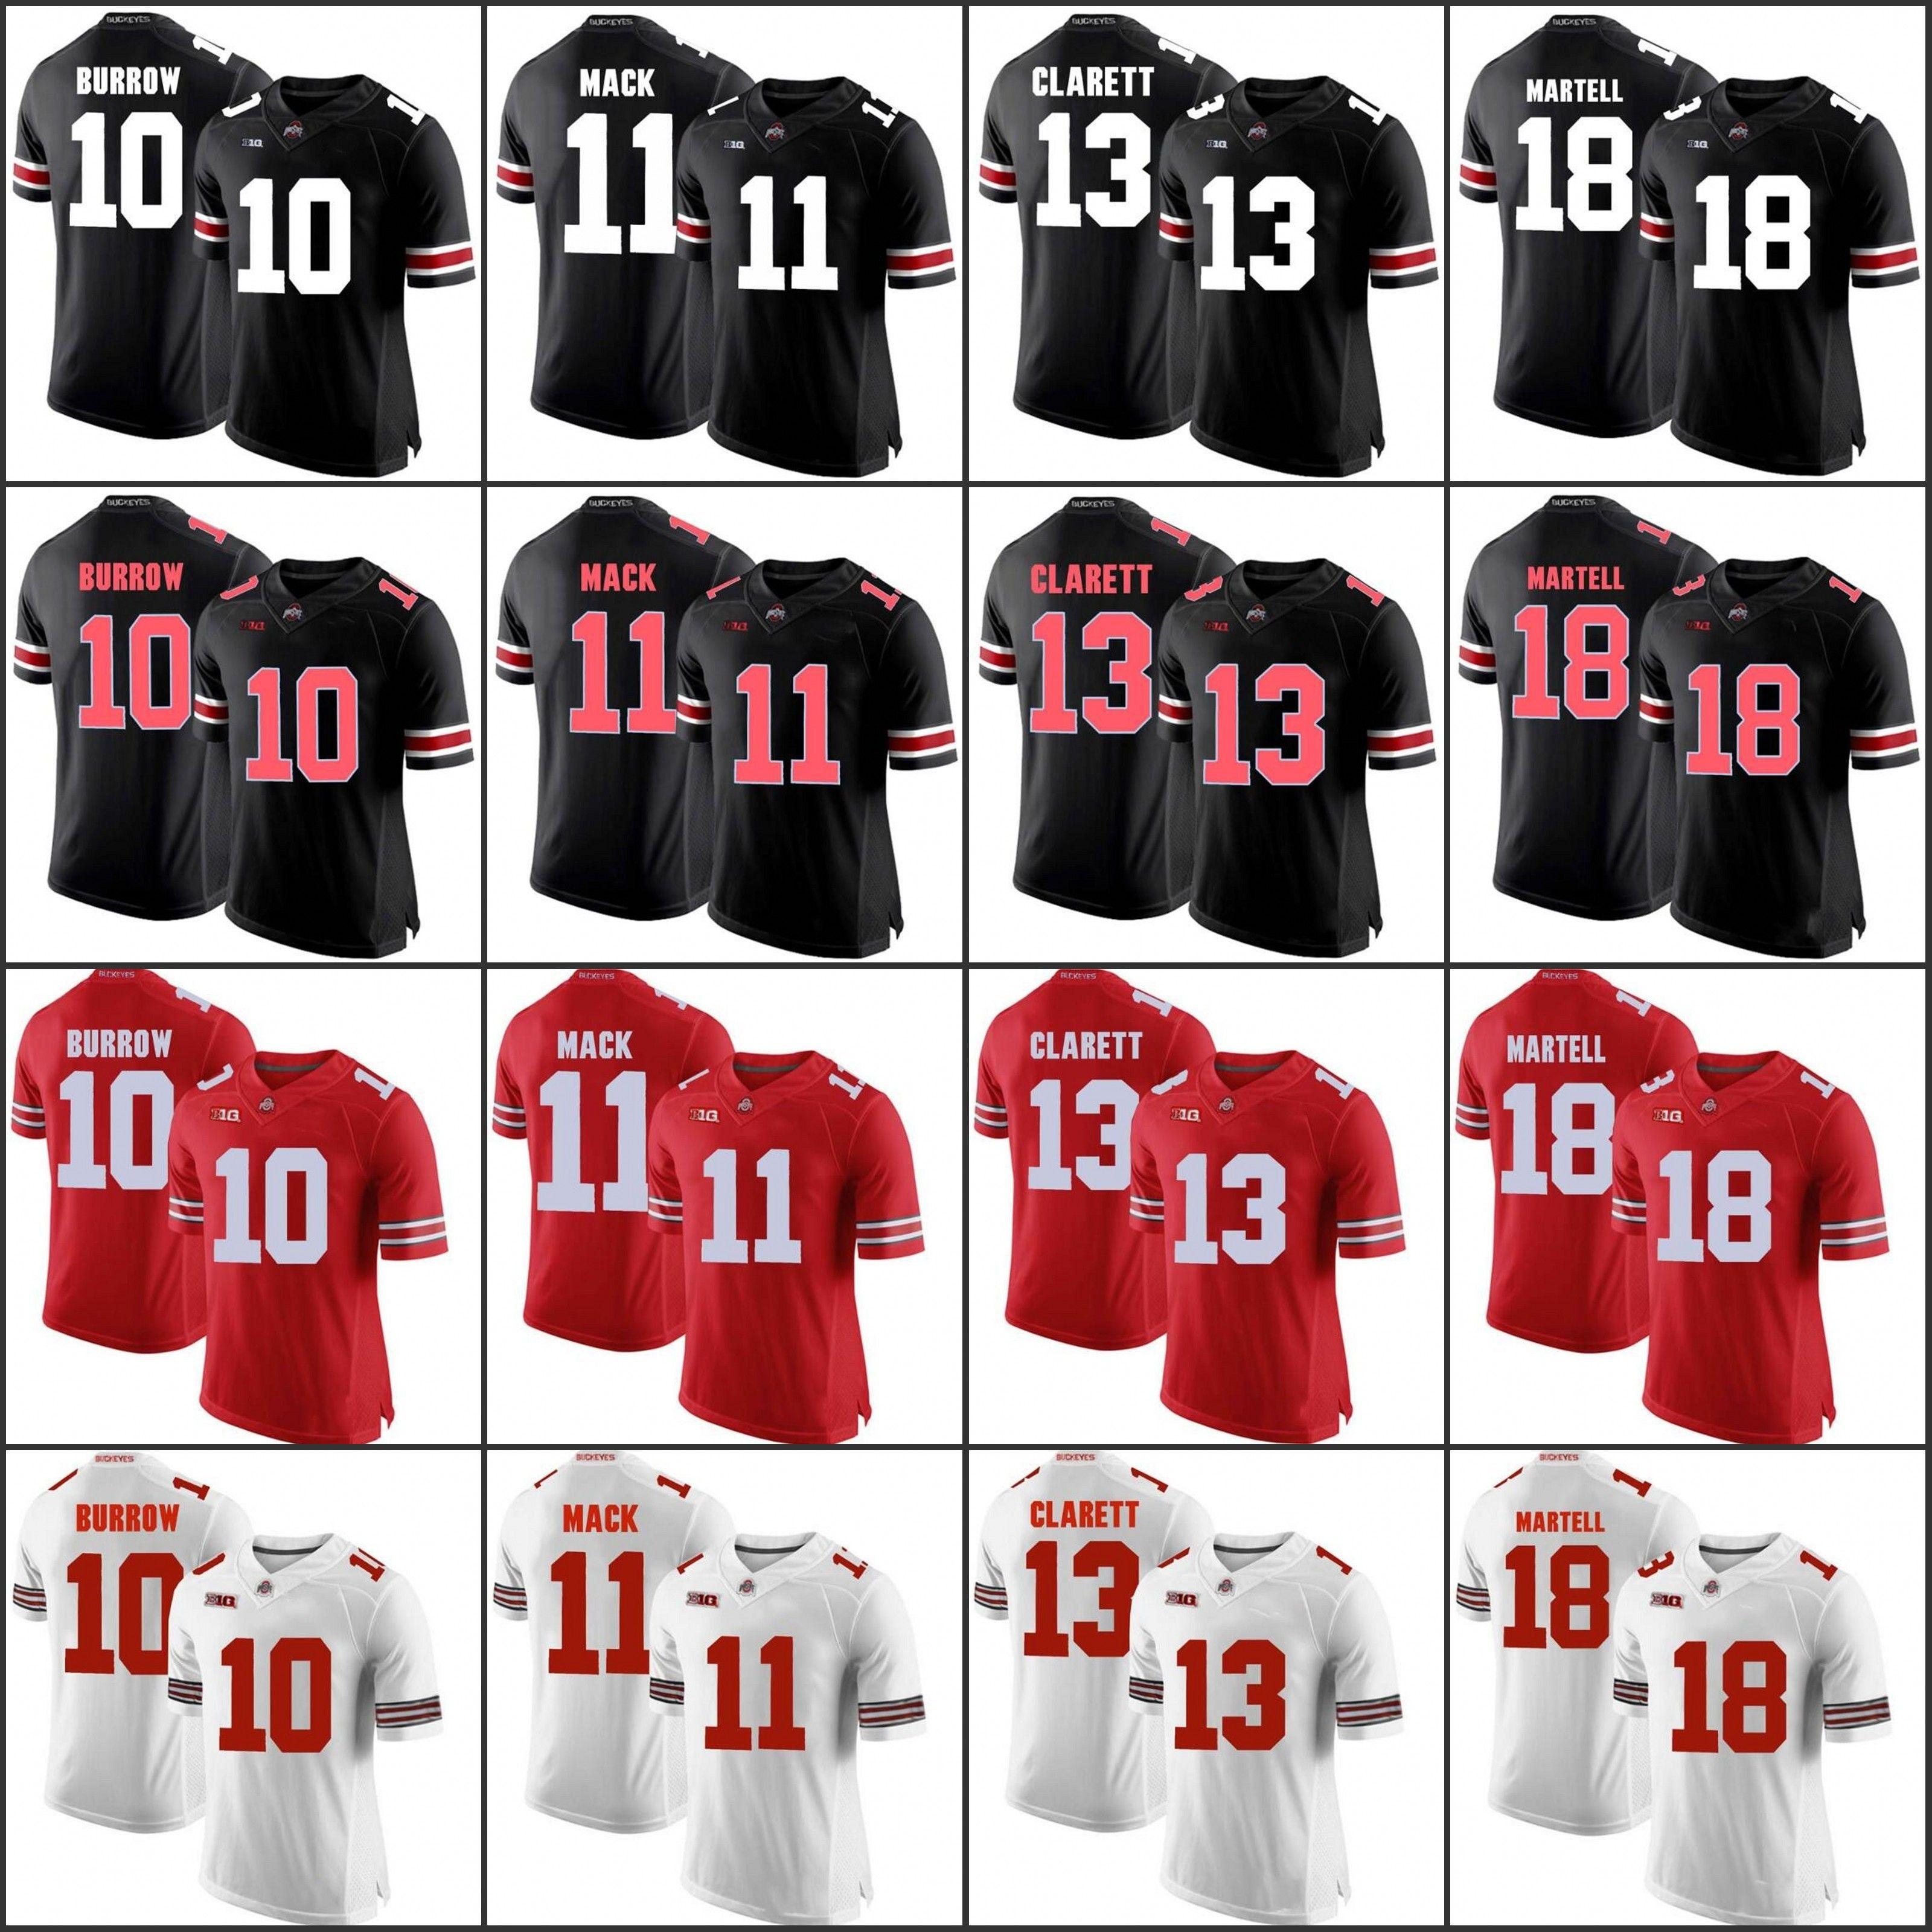 5b9f3efb9 2019 Custom Ohio State Buckeyes 2 J.K. Dobbins 18 Tate Martell Kids College  Football Jersey Personalized Mens Women Youth Jerseys From Gamemen